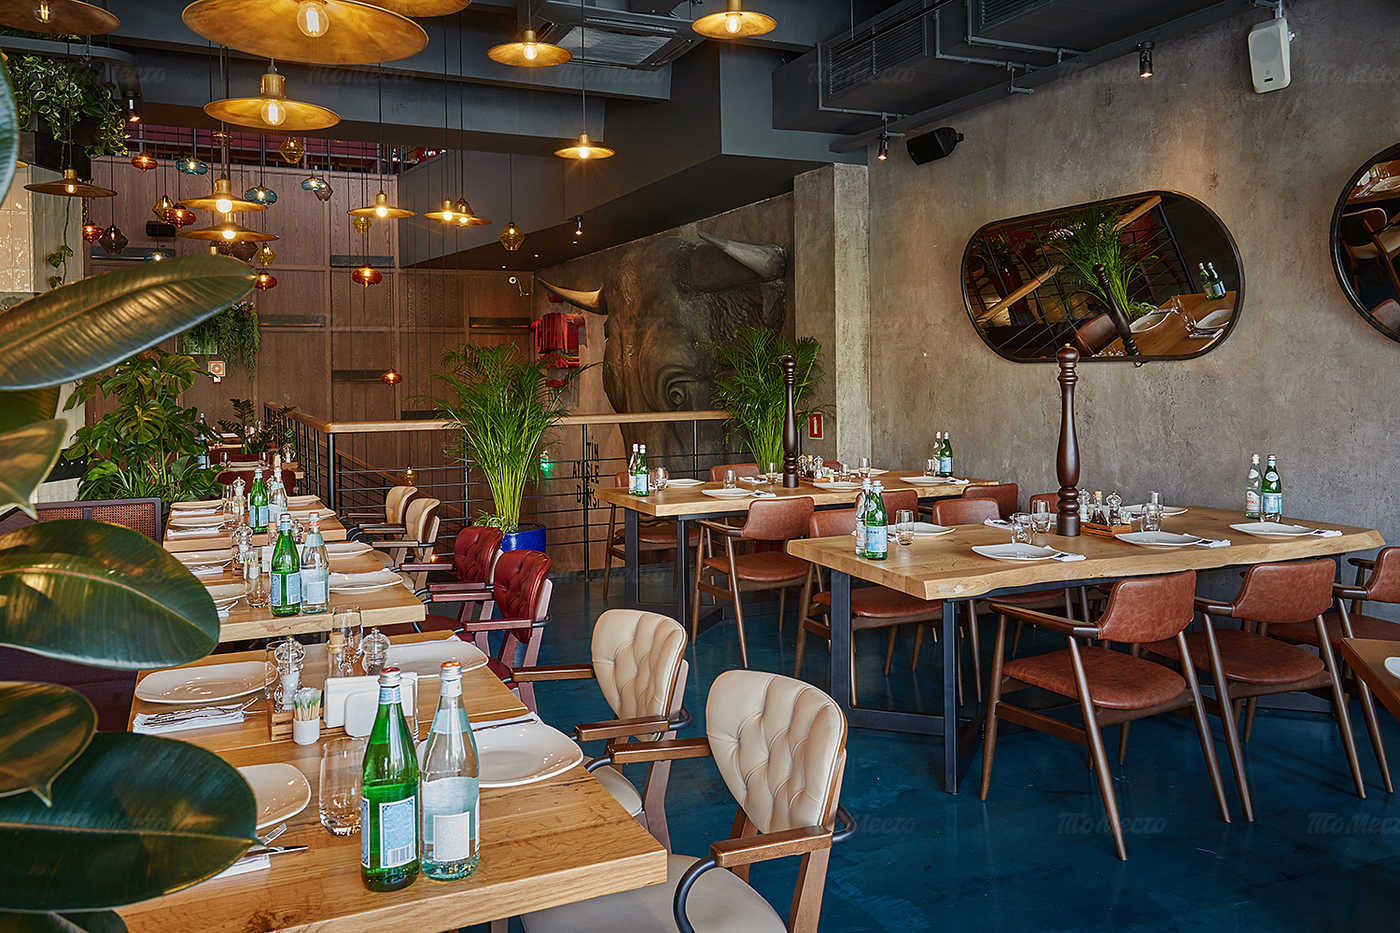 Ресторан Cihan (Джихан) На Новом Арбате фото 5